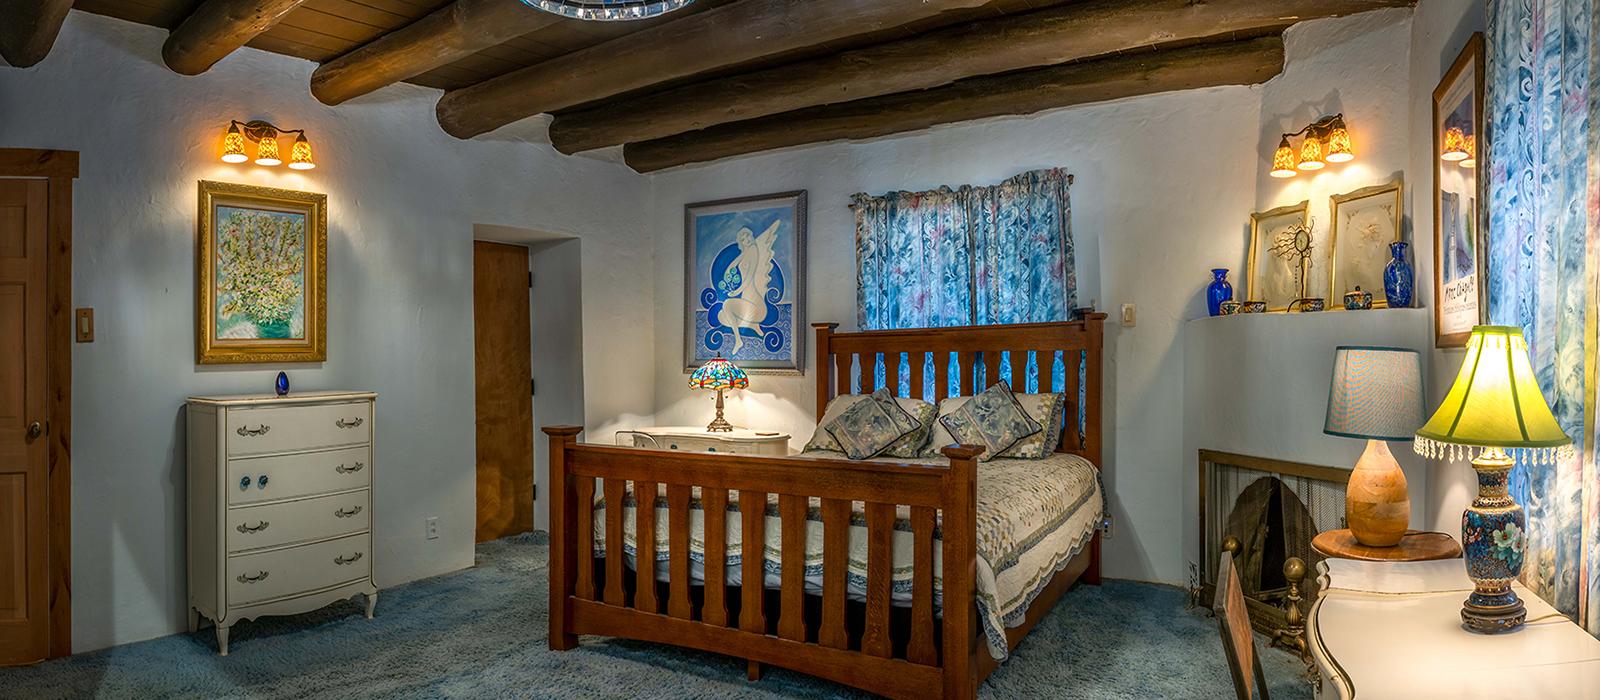 1600x700-housing-blueroom-right